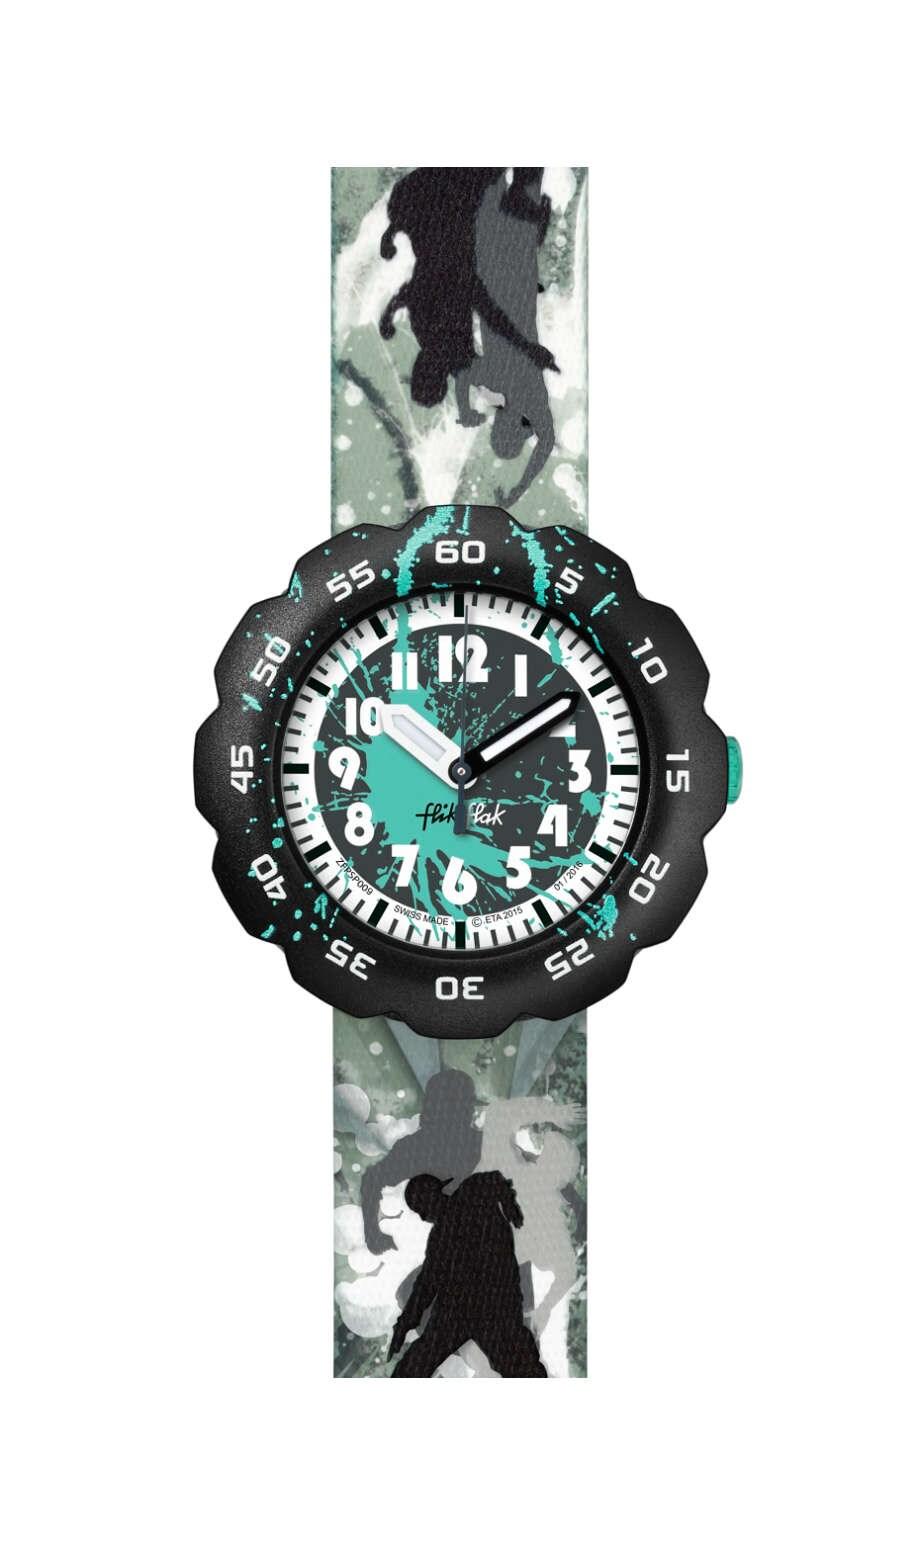 Swatch - HAND HOPS - 1